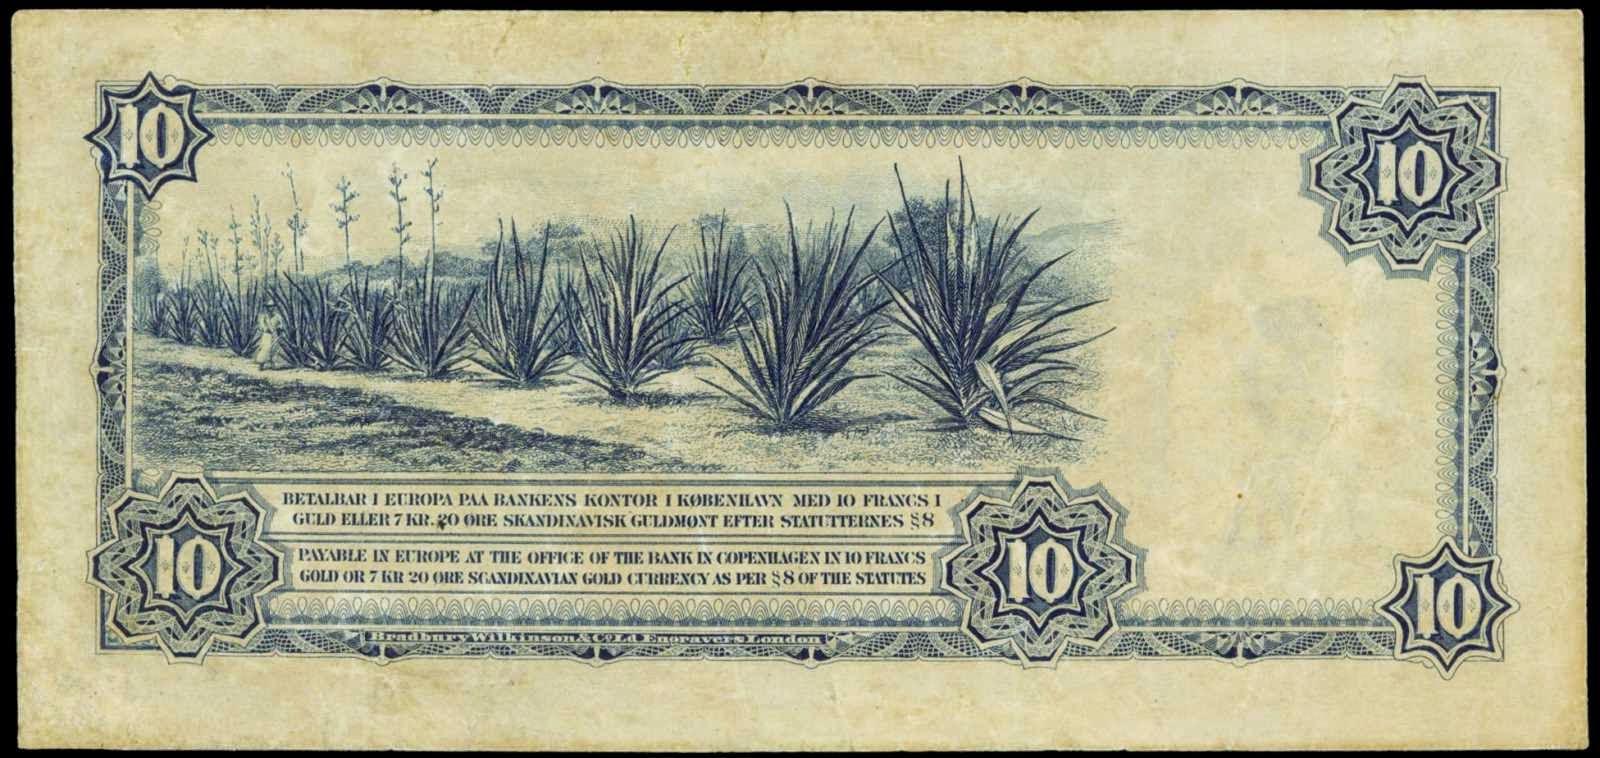 Danish West Indies banknotes 10 Francs